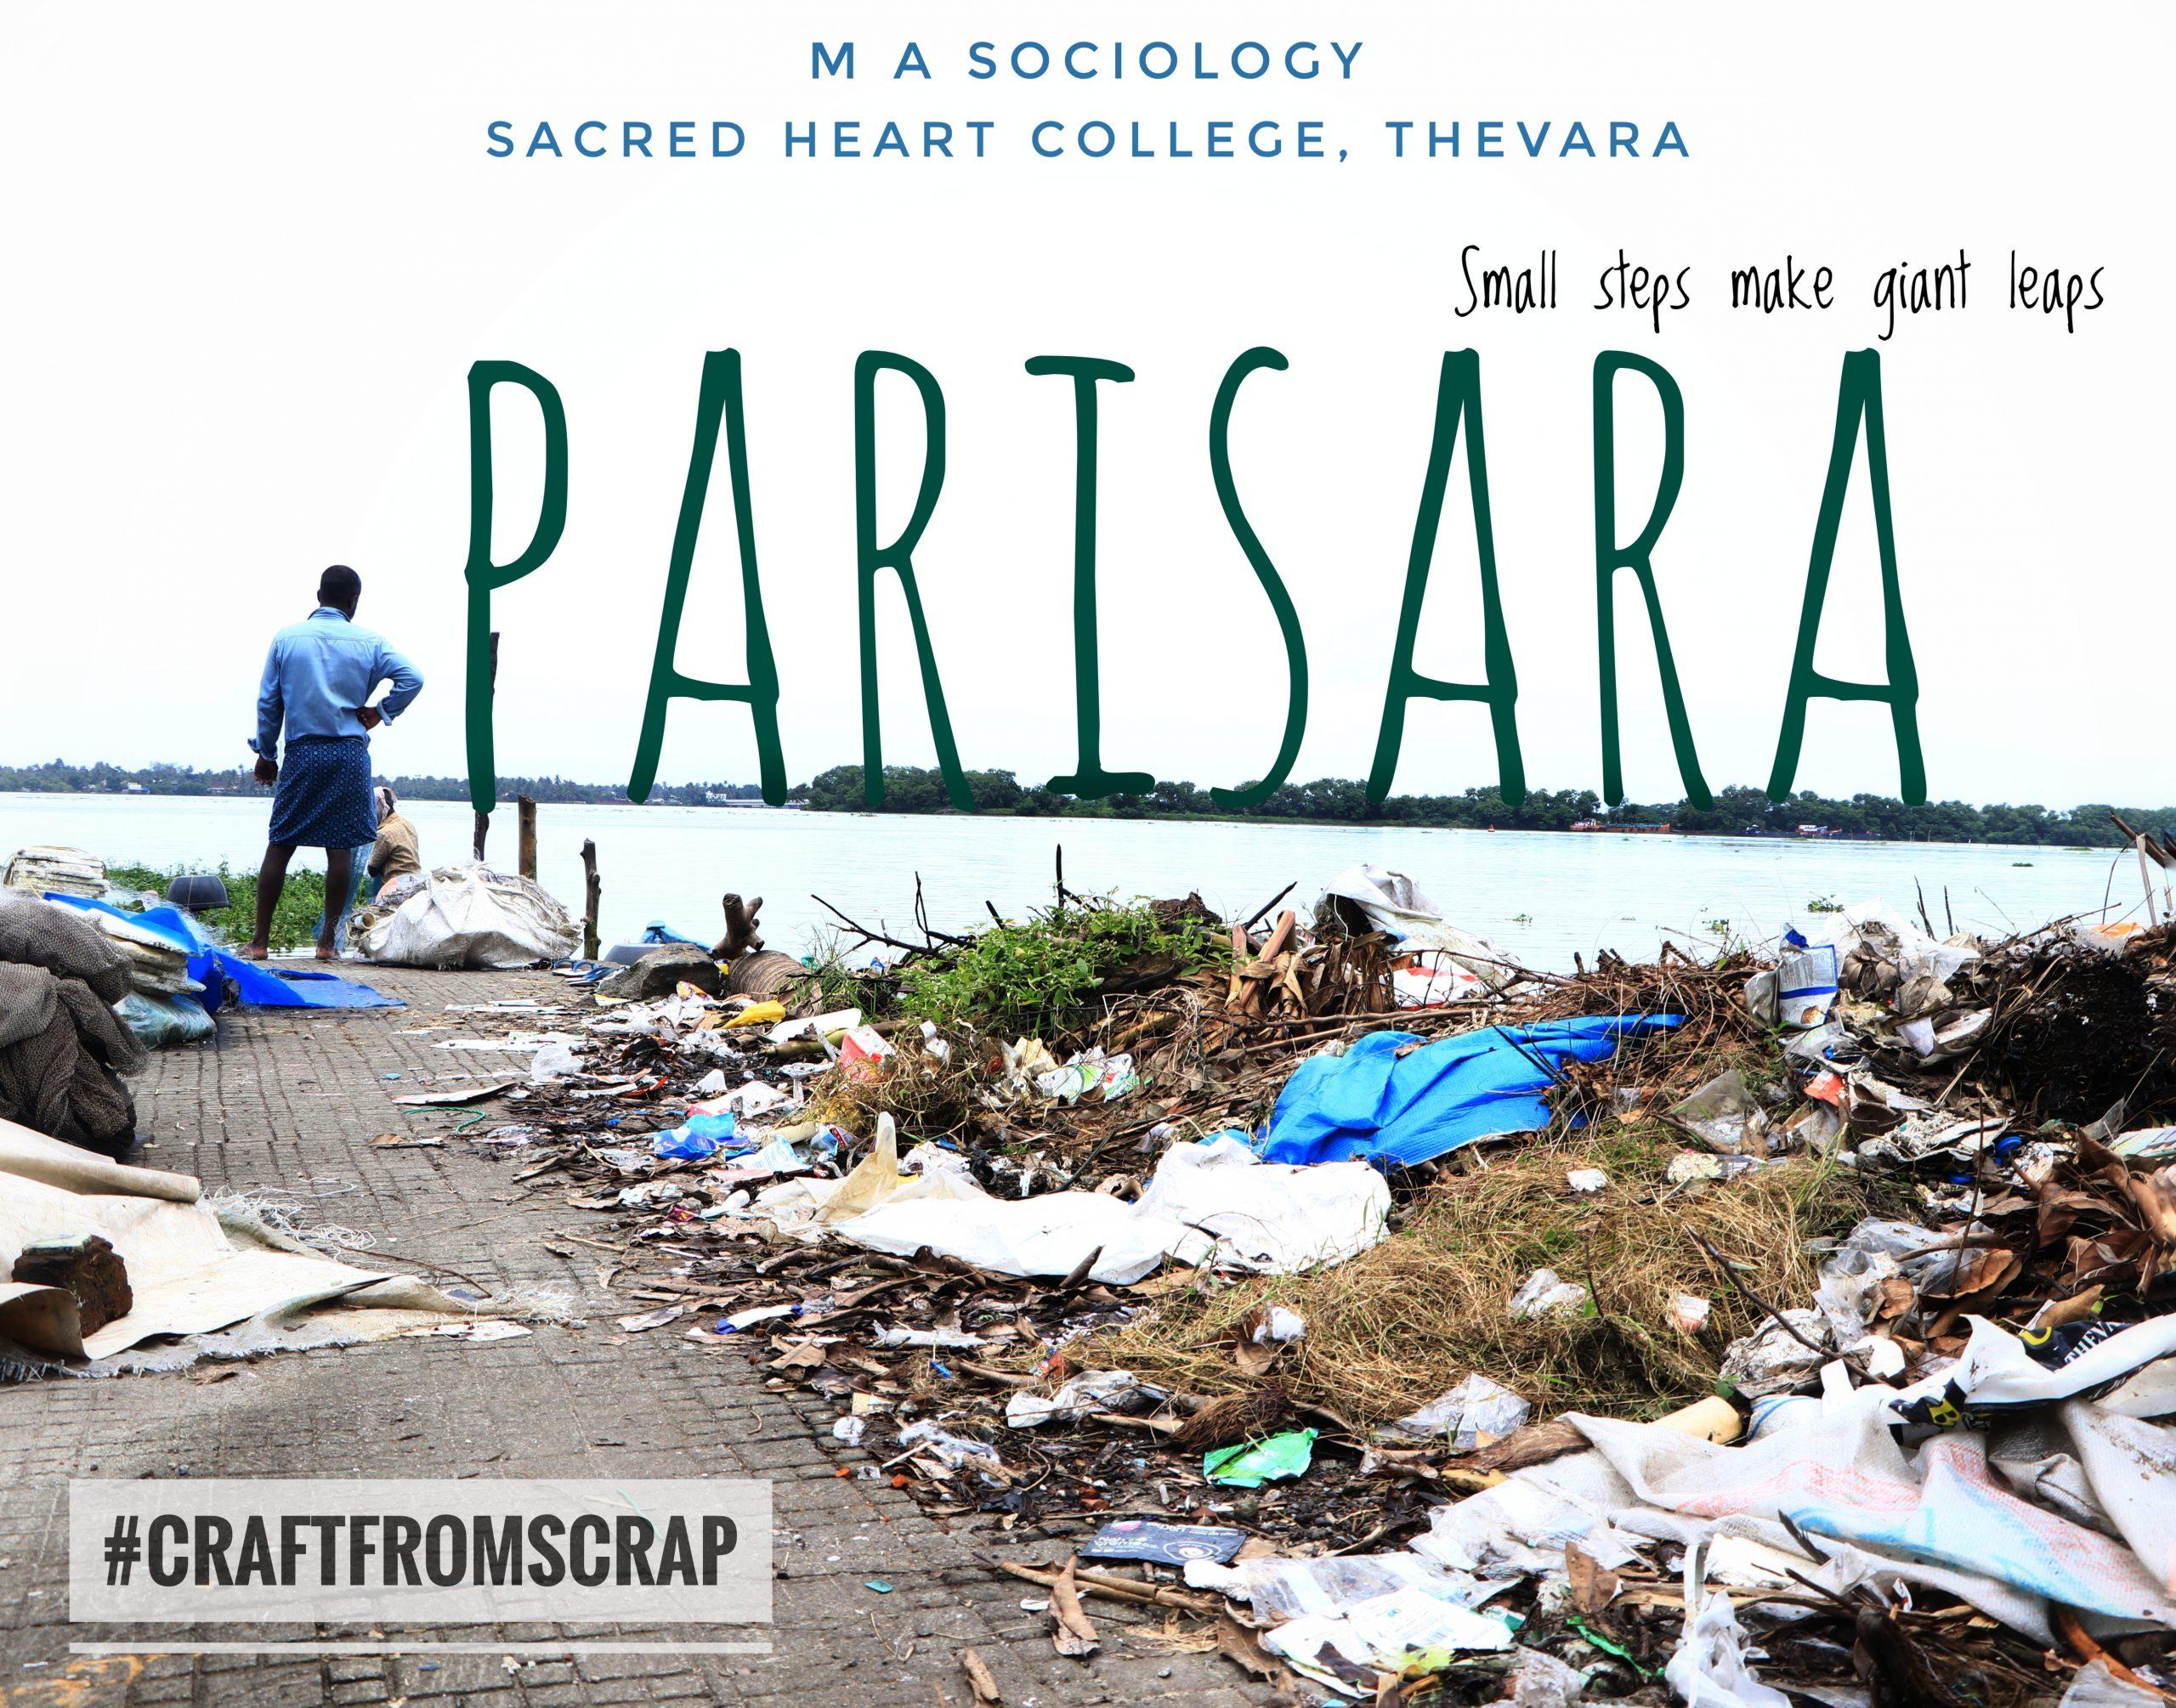 Parisara Eco – campaign